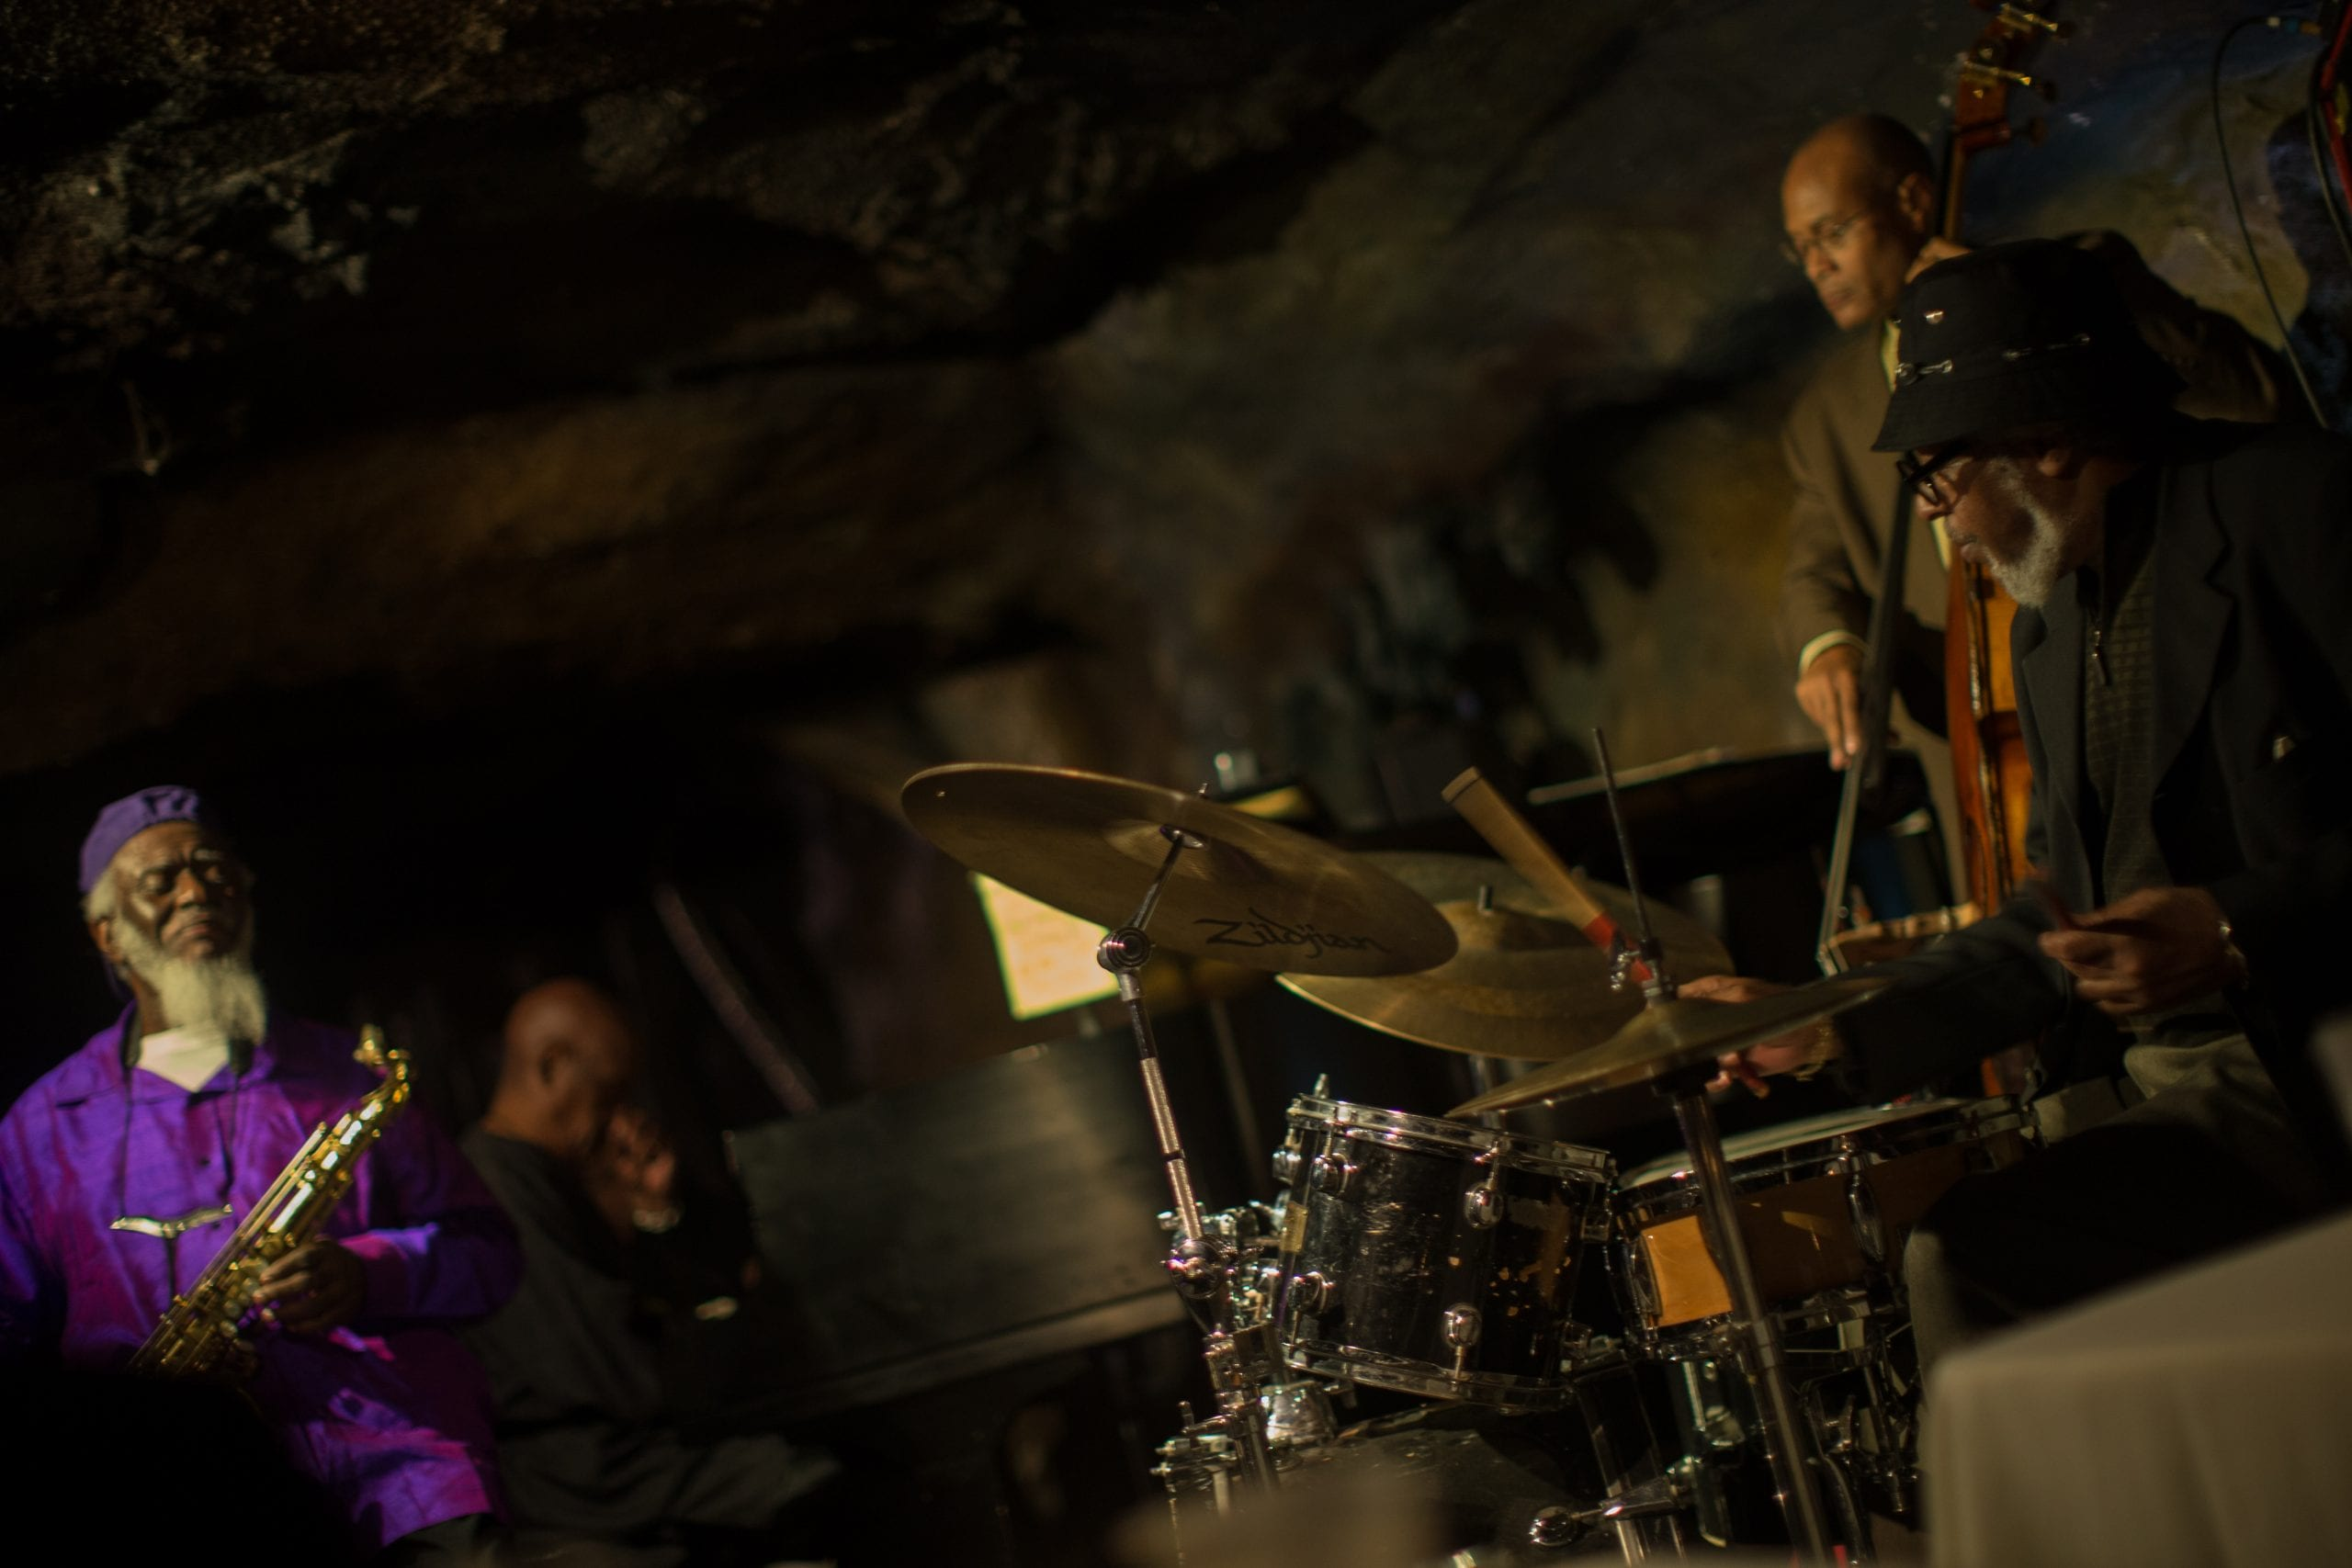 Pharoah Sanders and his quartet. David L. McDuffie/CapitalBop